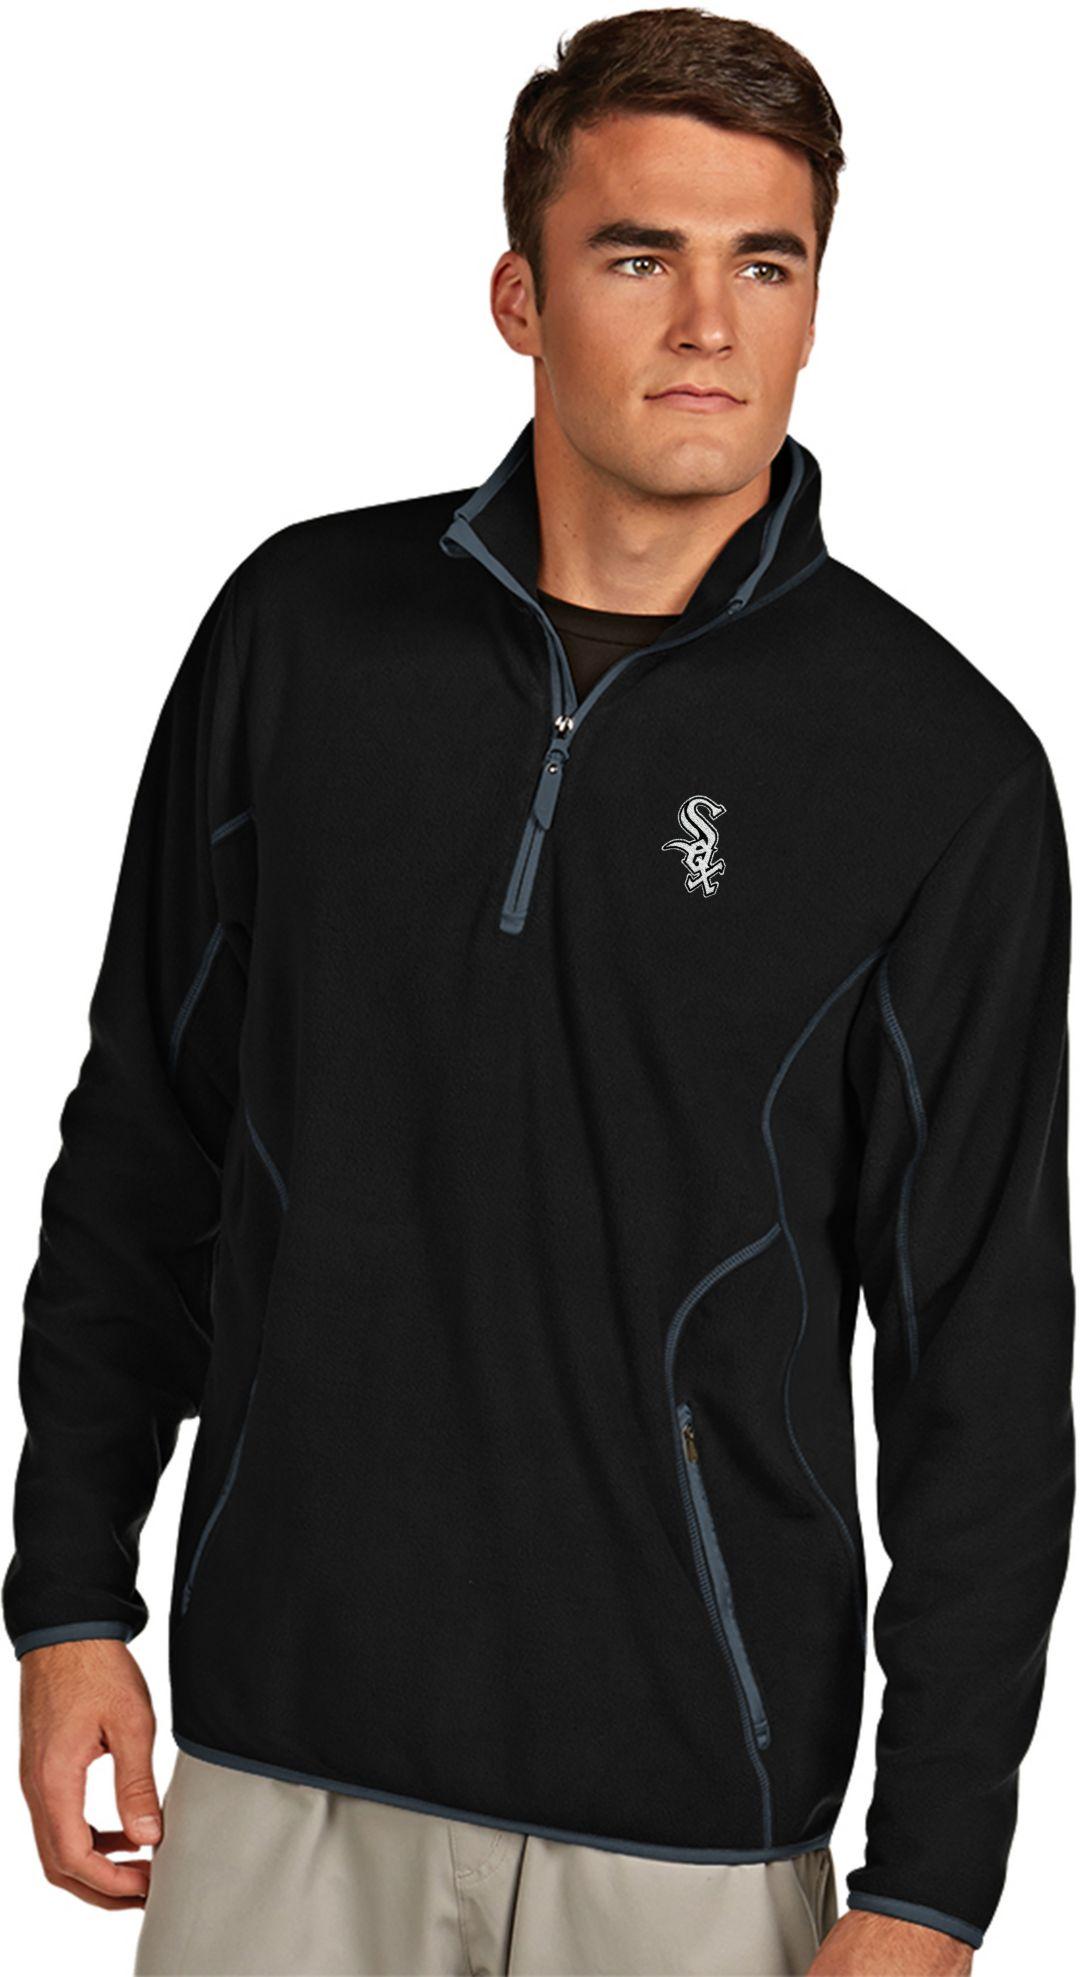 reputable site a5473 1fa8a Antigua Men's Chicago White Sox Quarter-Zip Black Ice Pullover